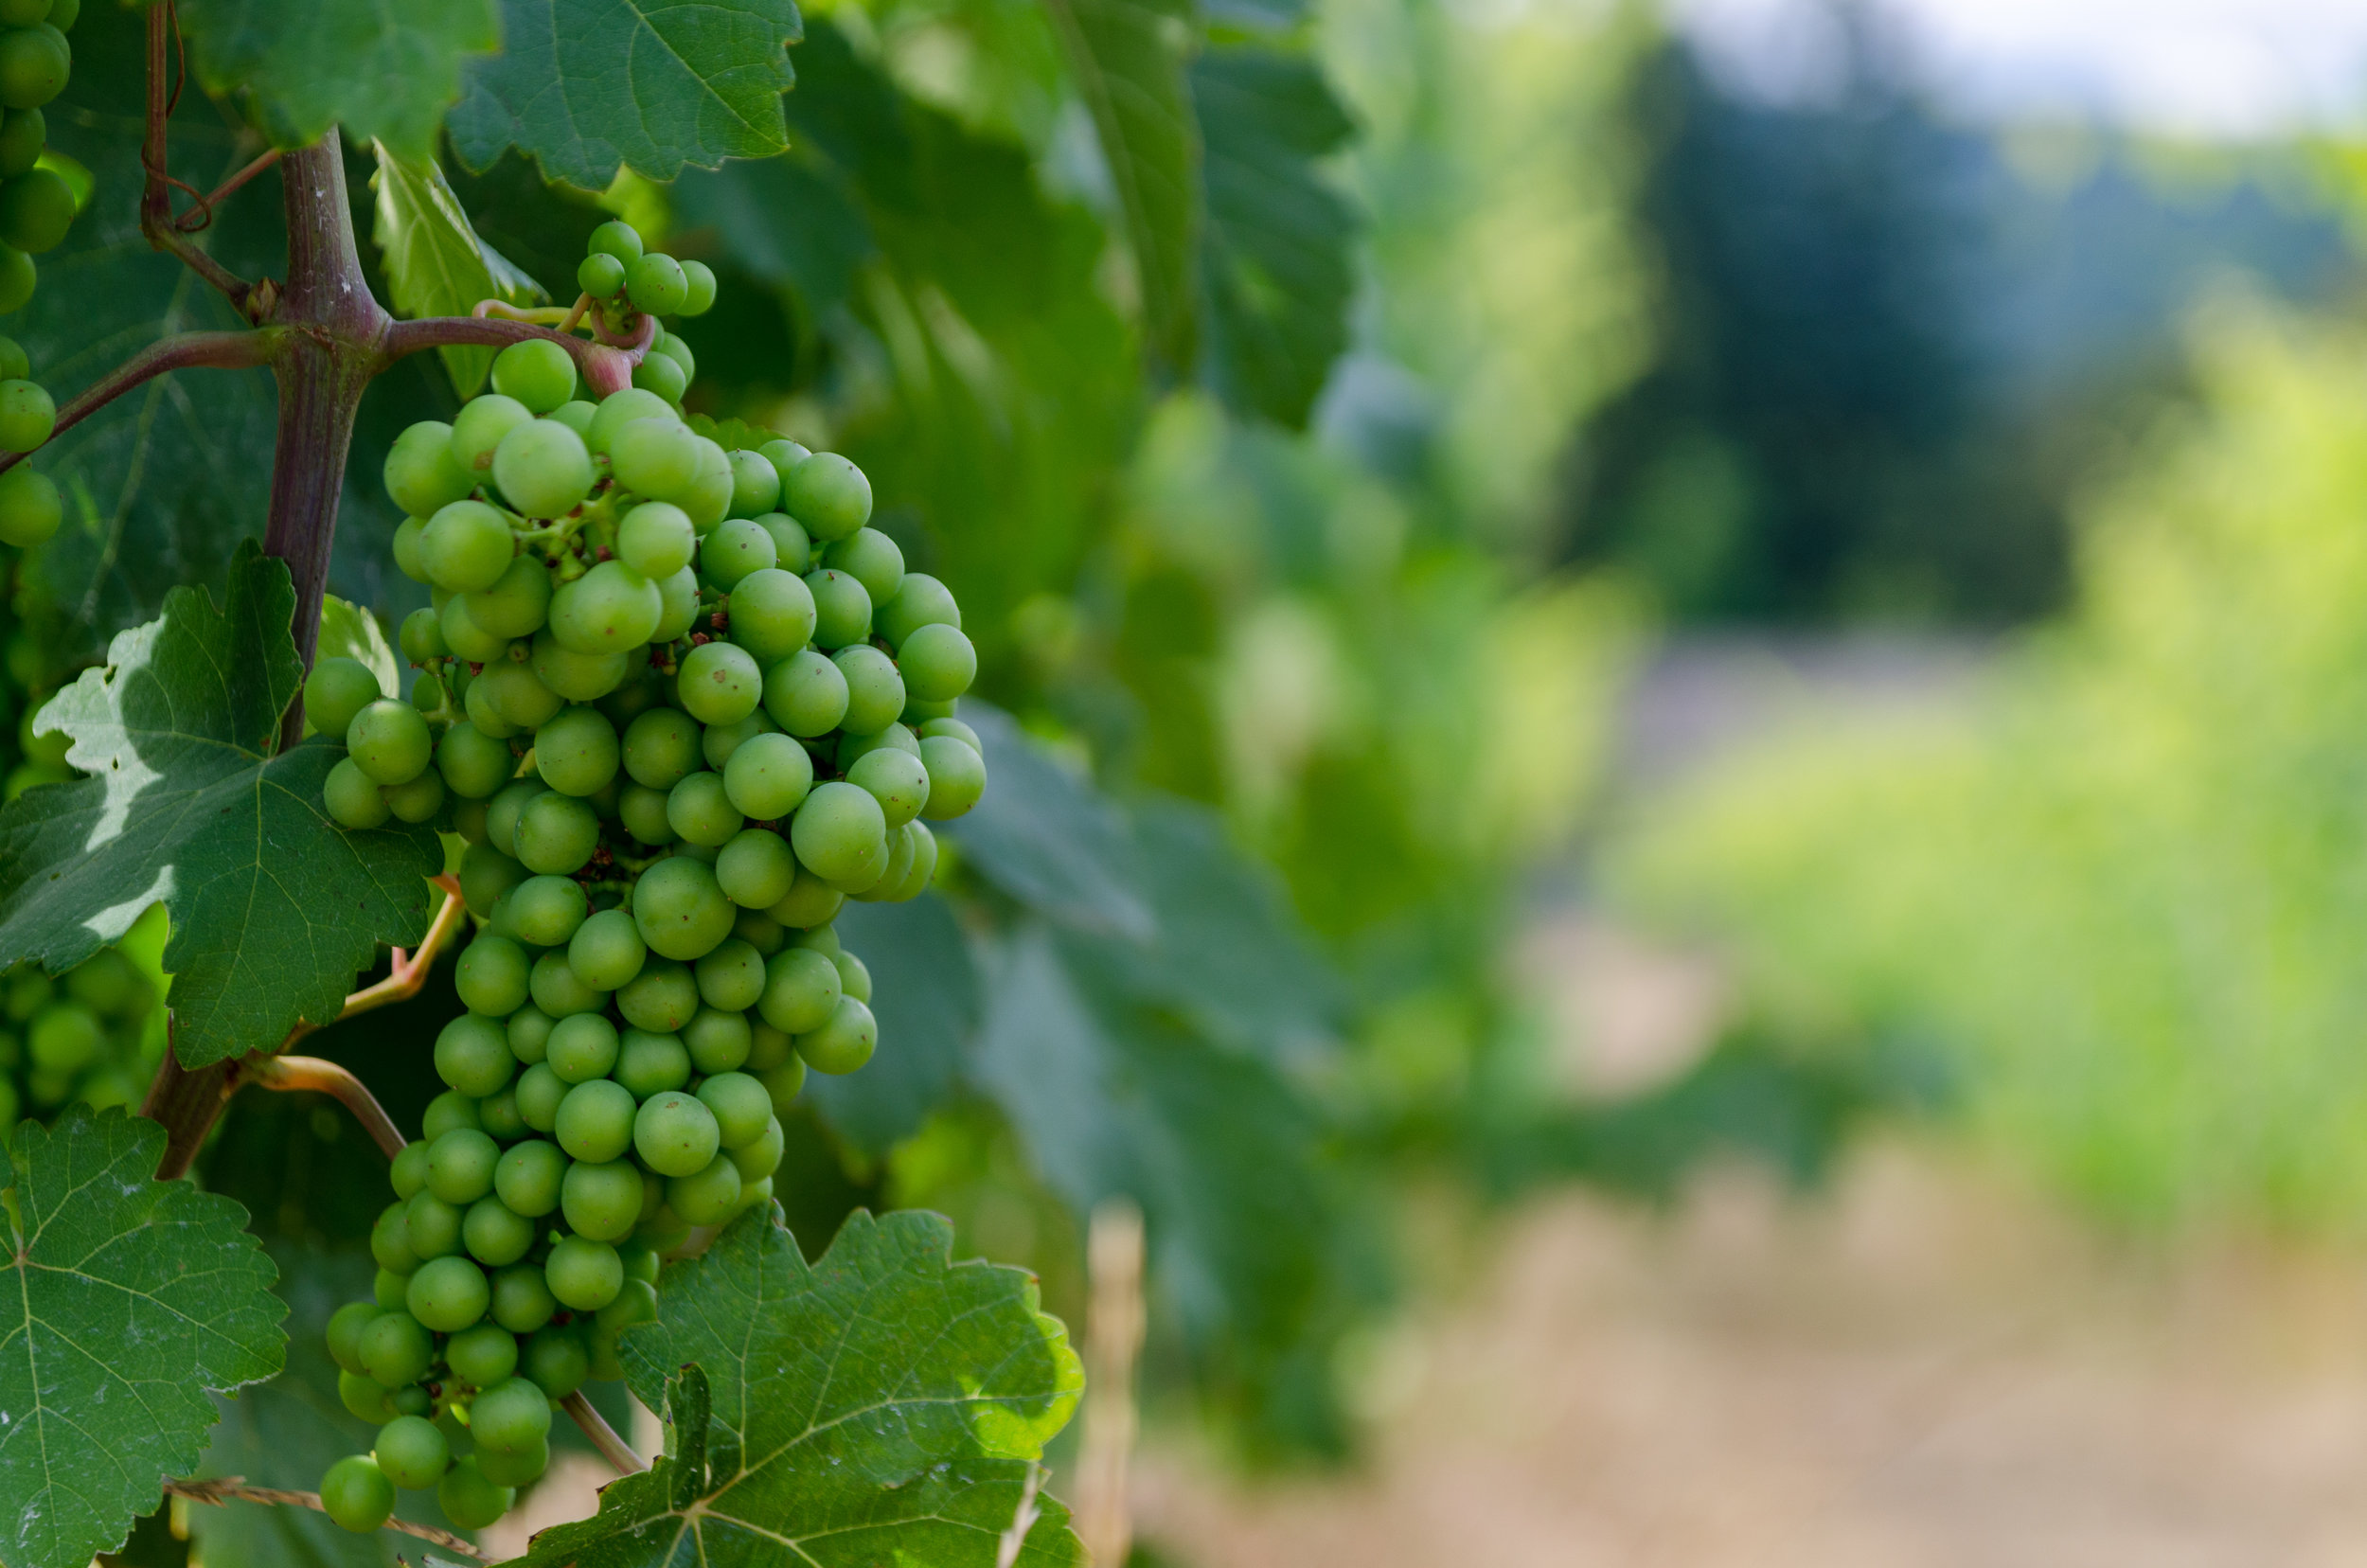 Ripening Wine Grapes Venturi Schulze Vineyards